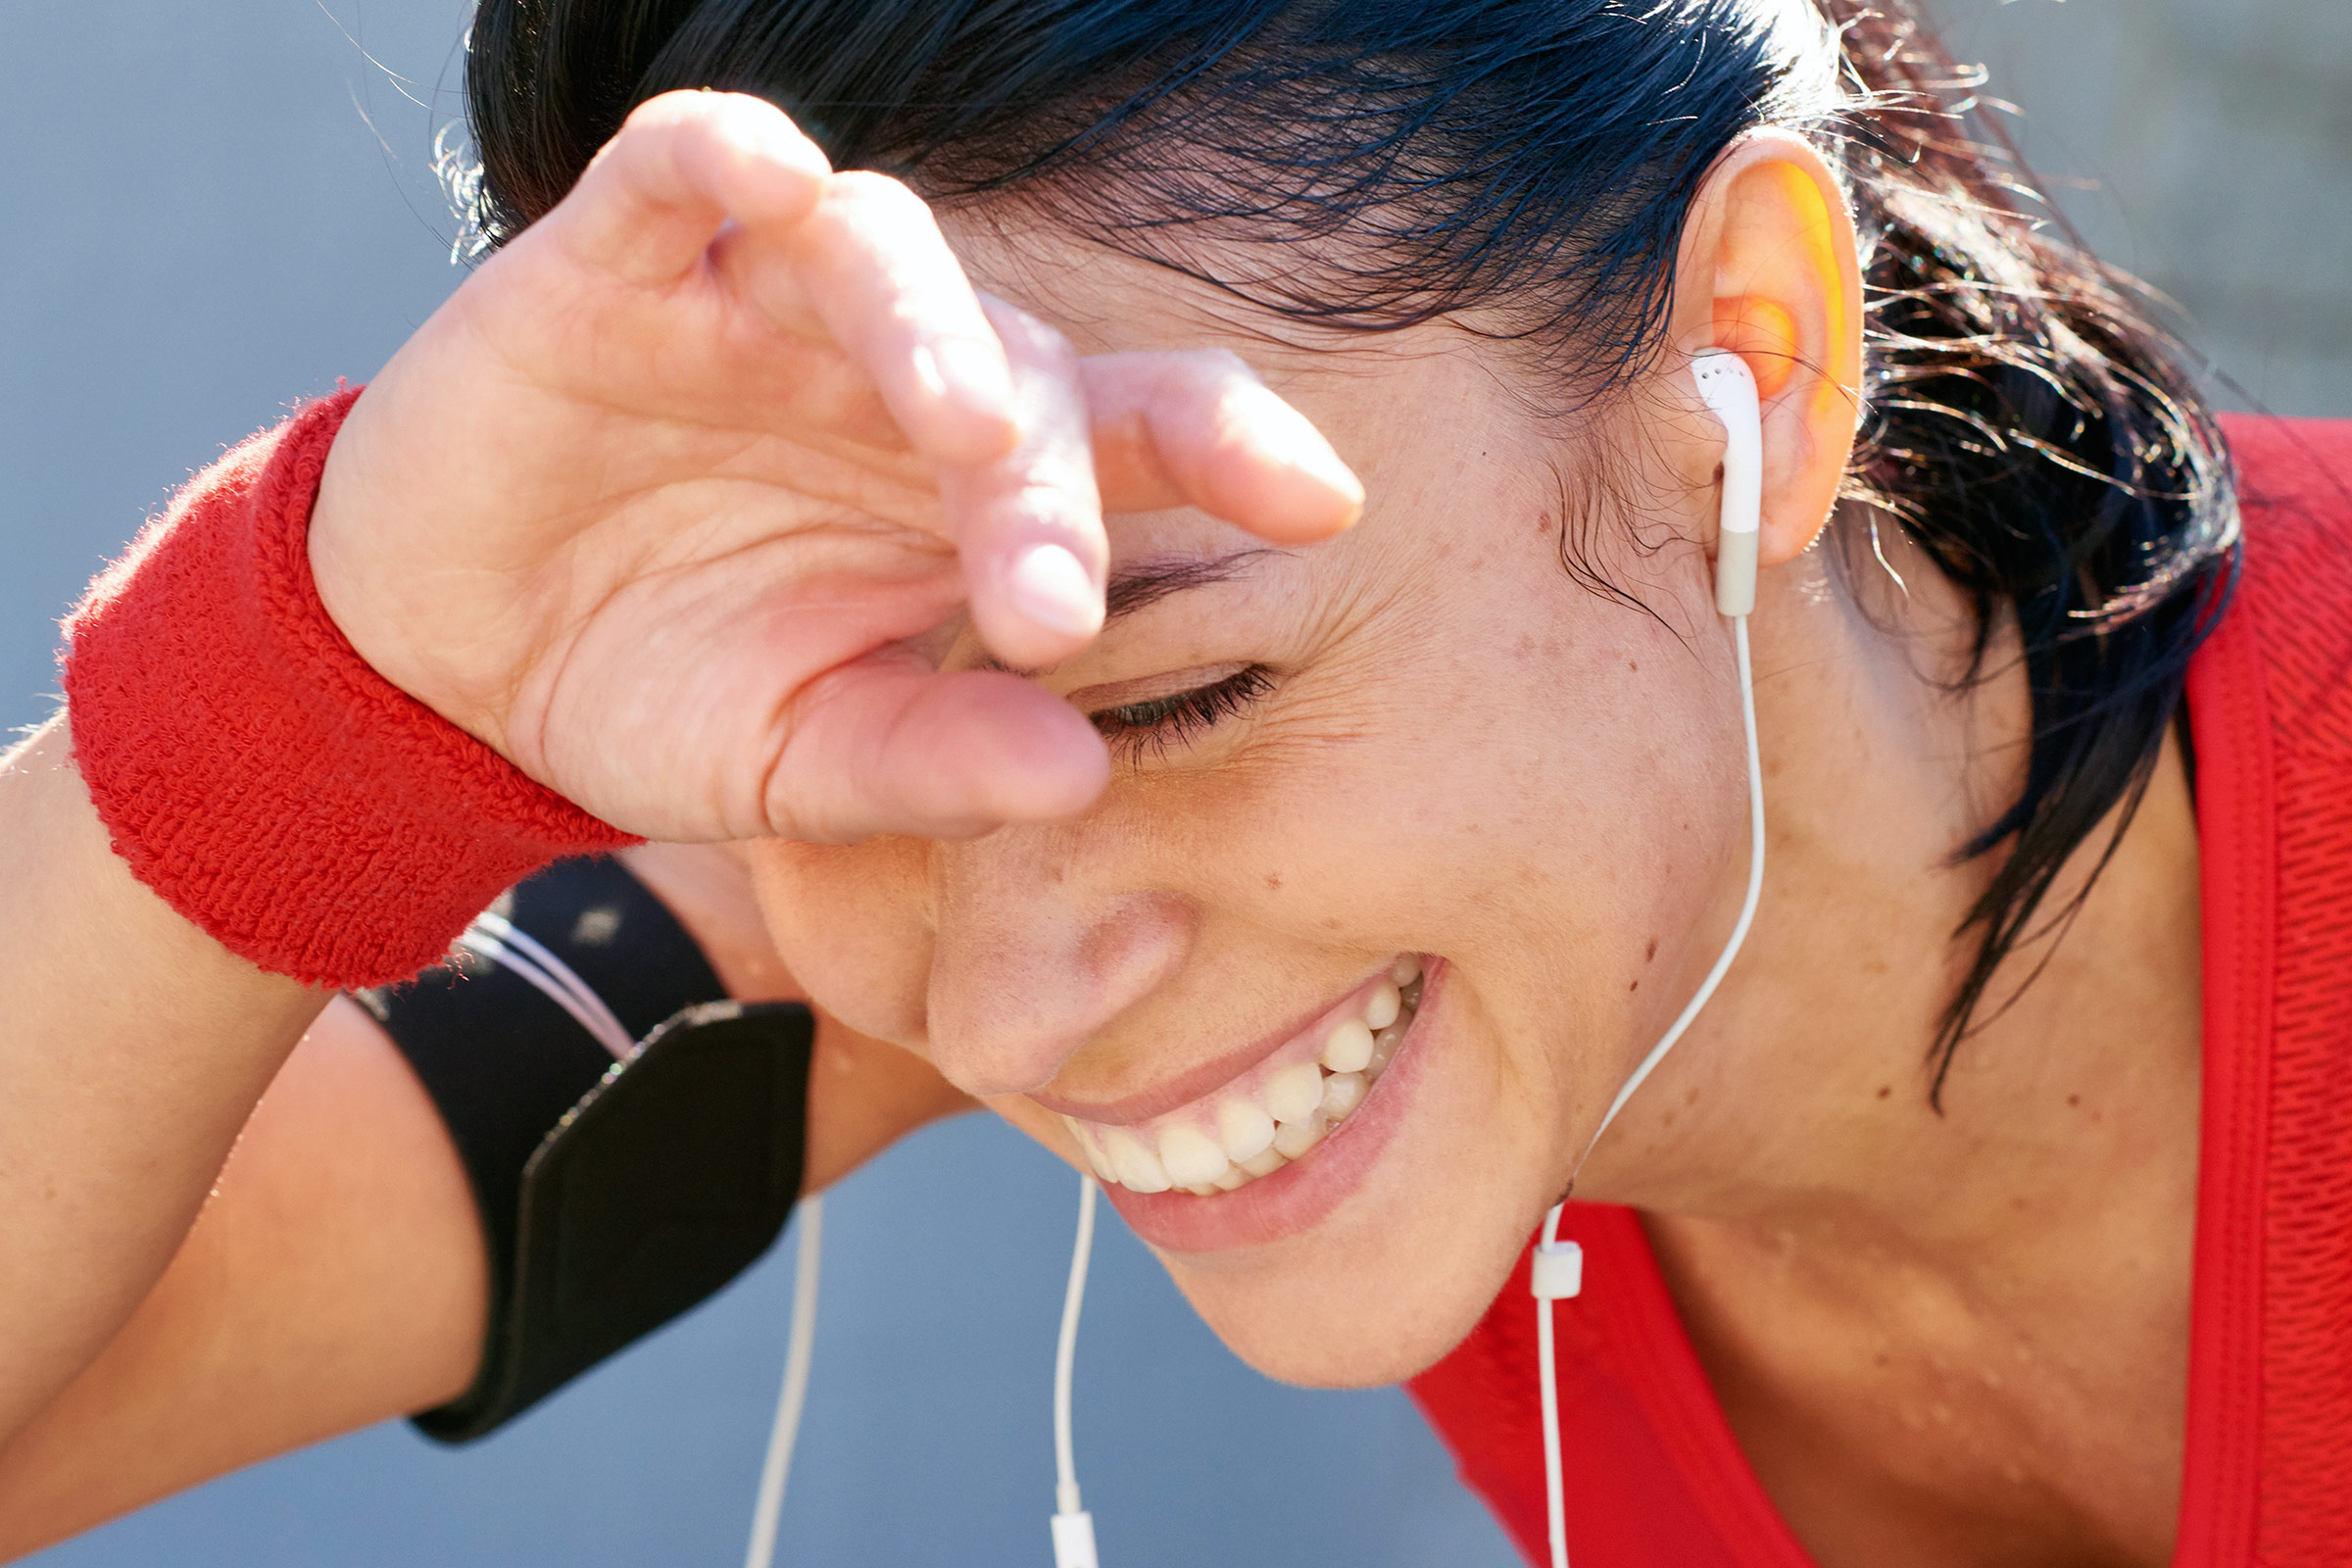 چگونه هورمون کورتیزول هورمون استرس بدن را کم کنیم؟